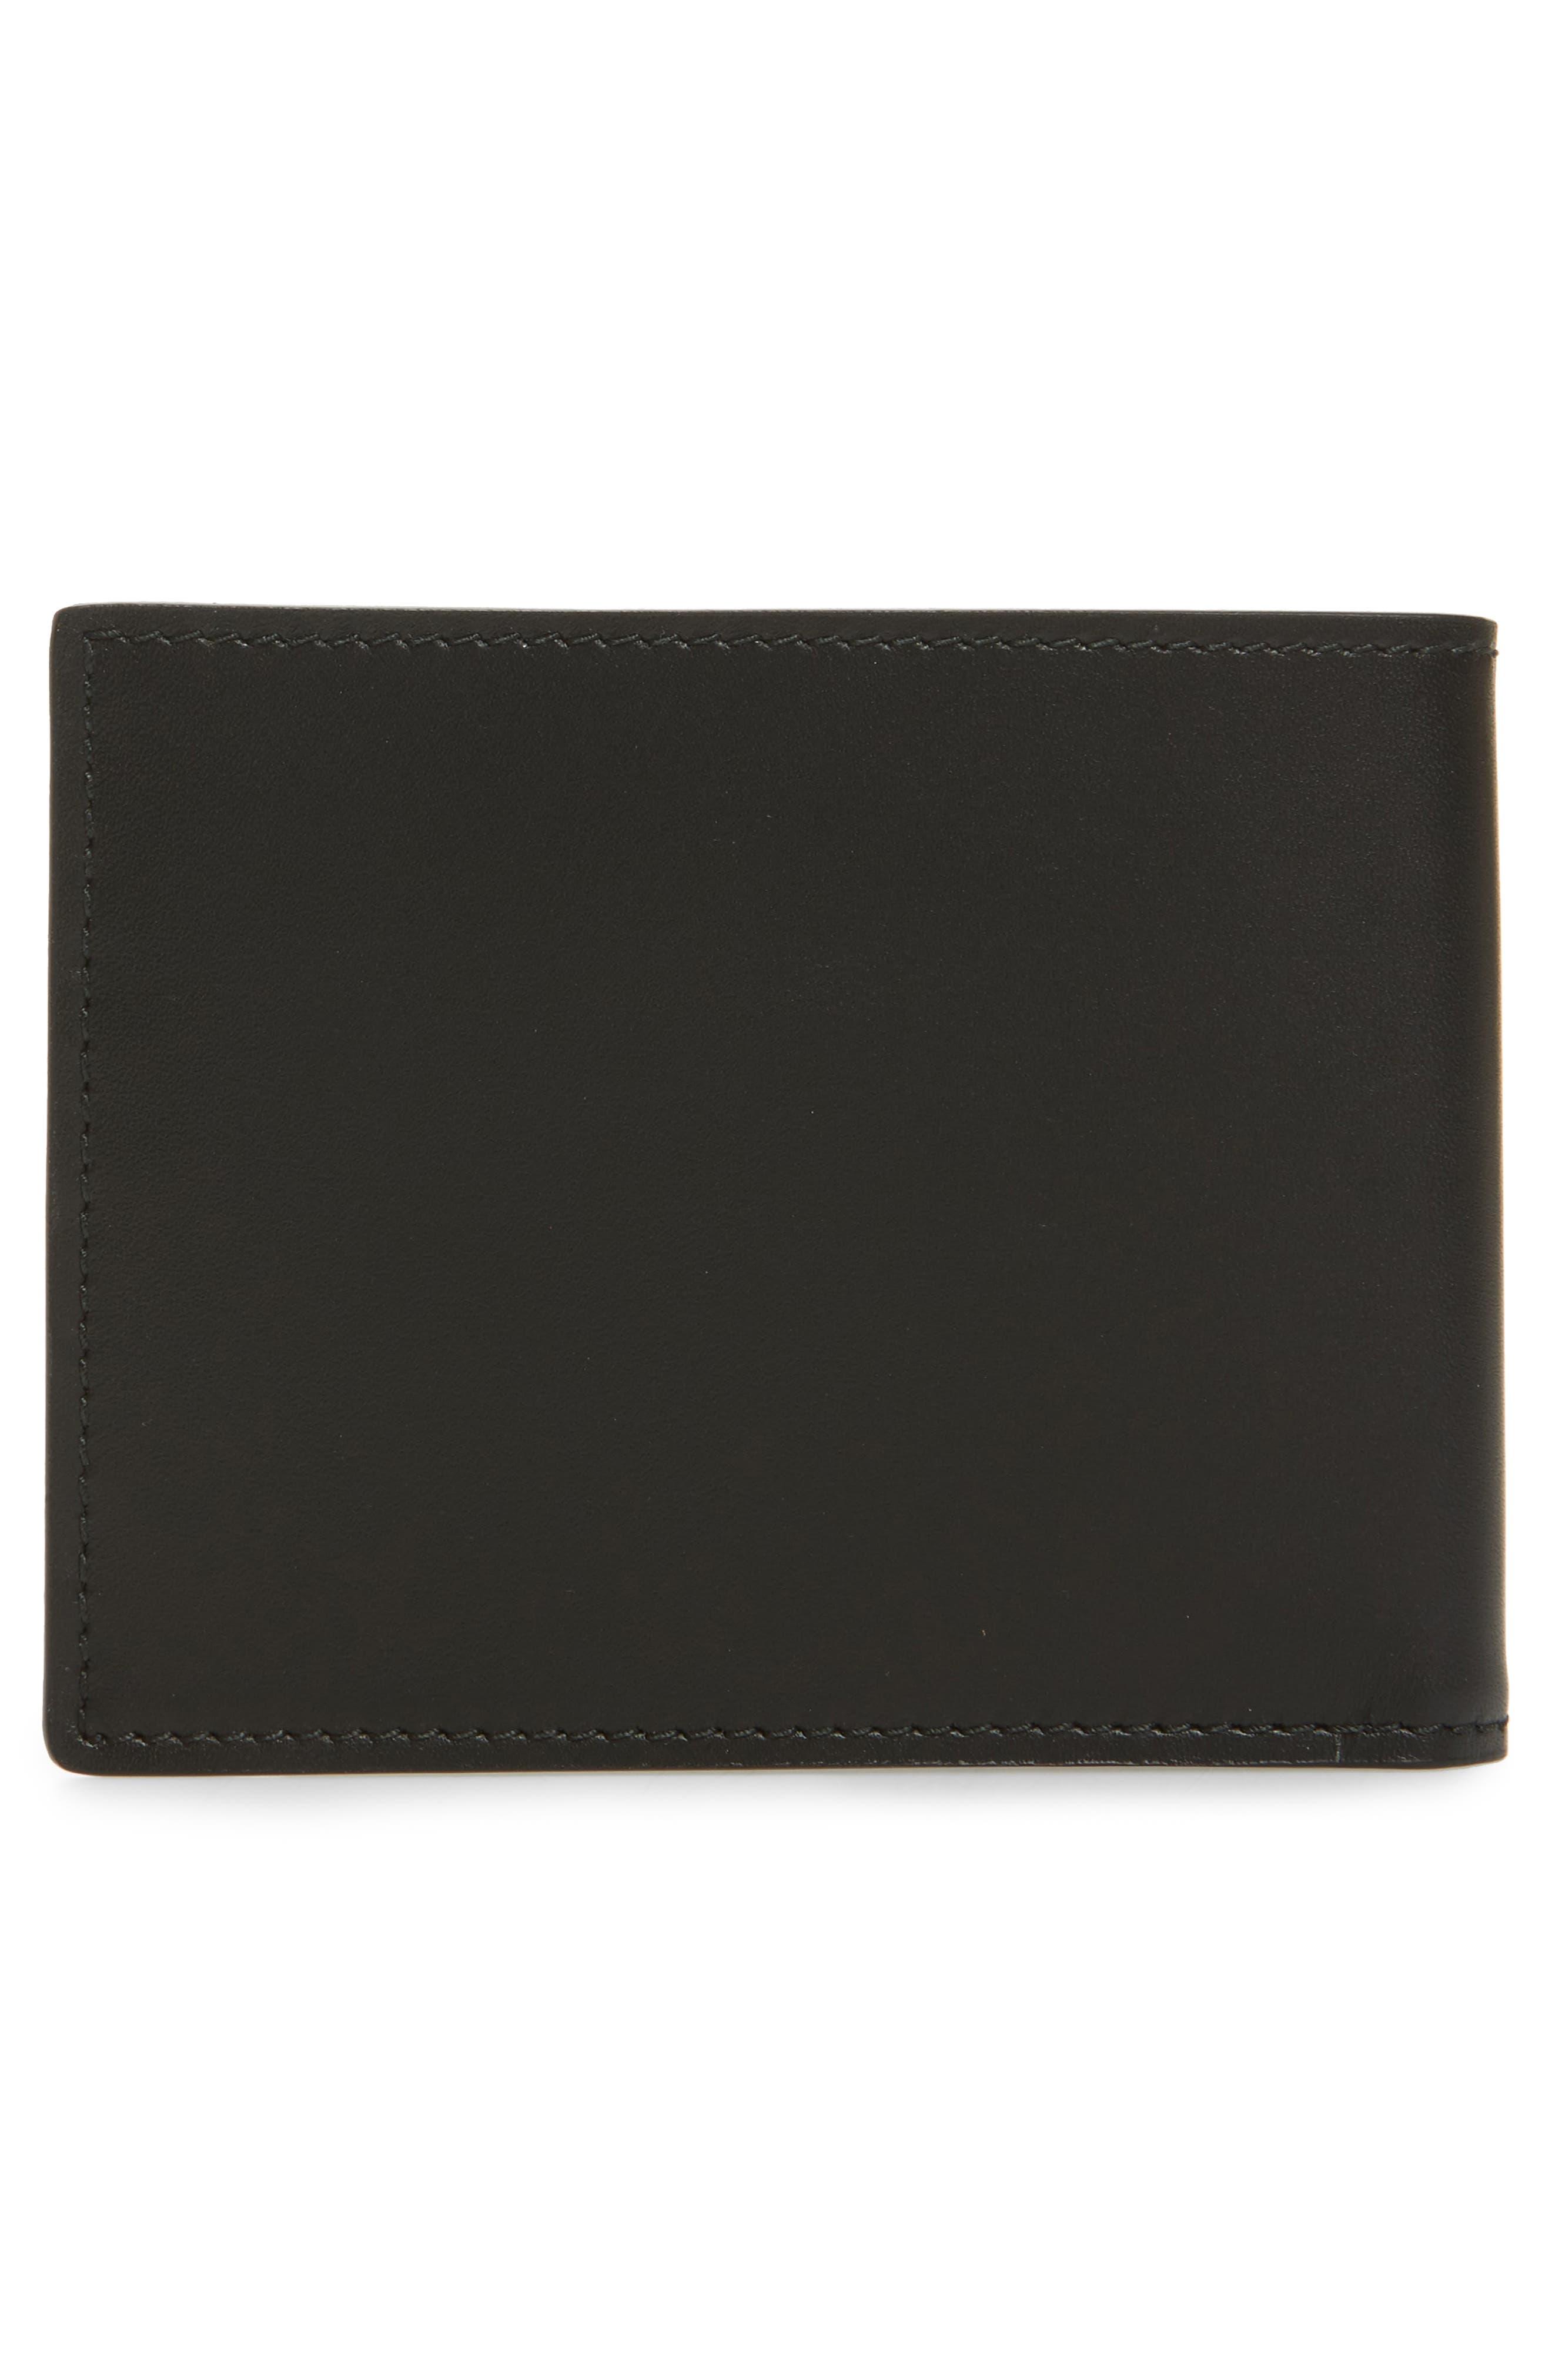 Alternate Image 3  - Salvatore Ferragamo Calfskin Leather Bifold Card Case